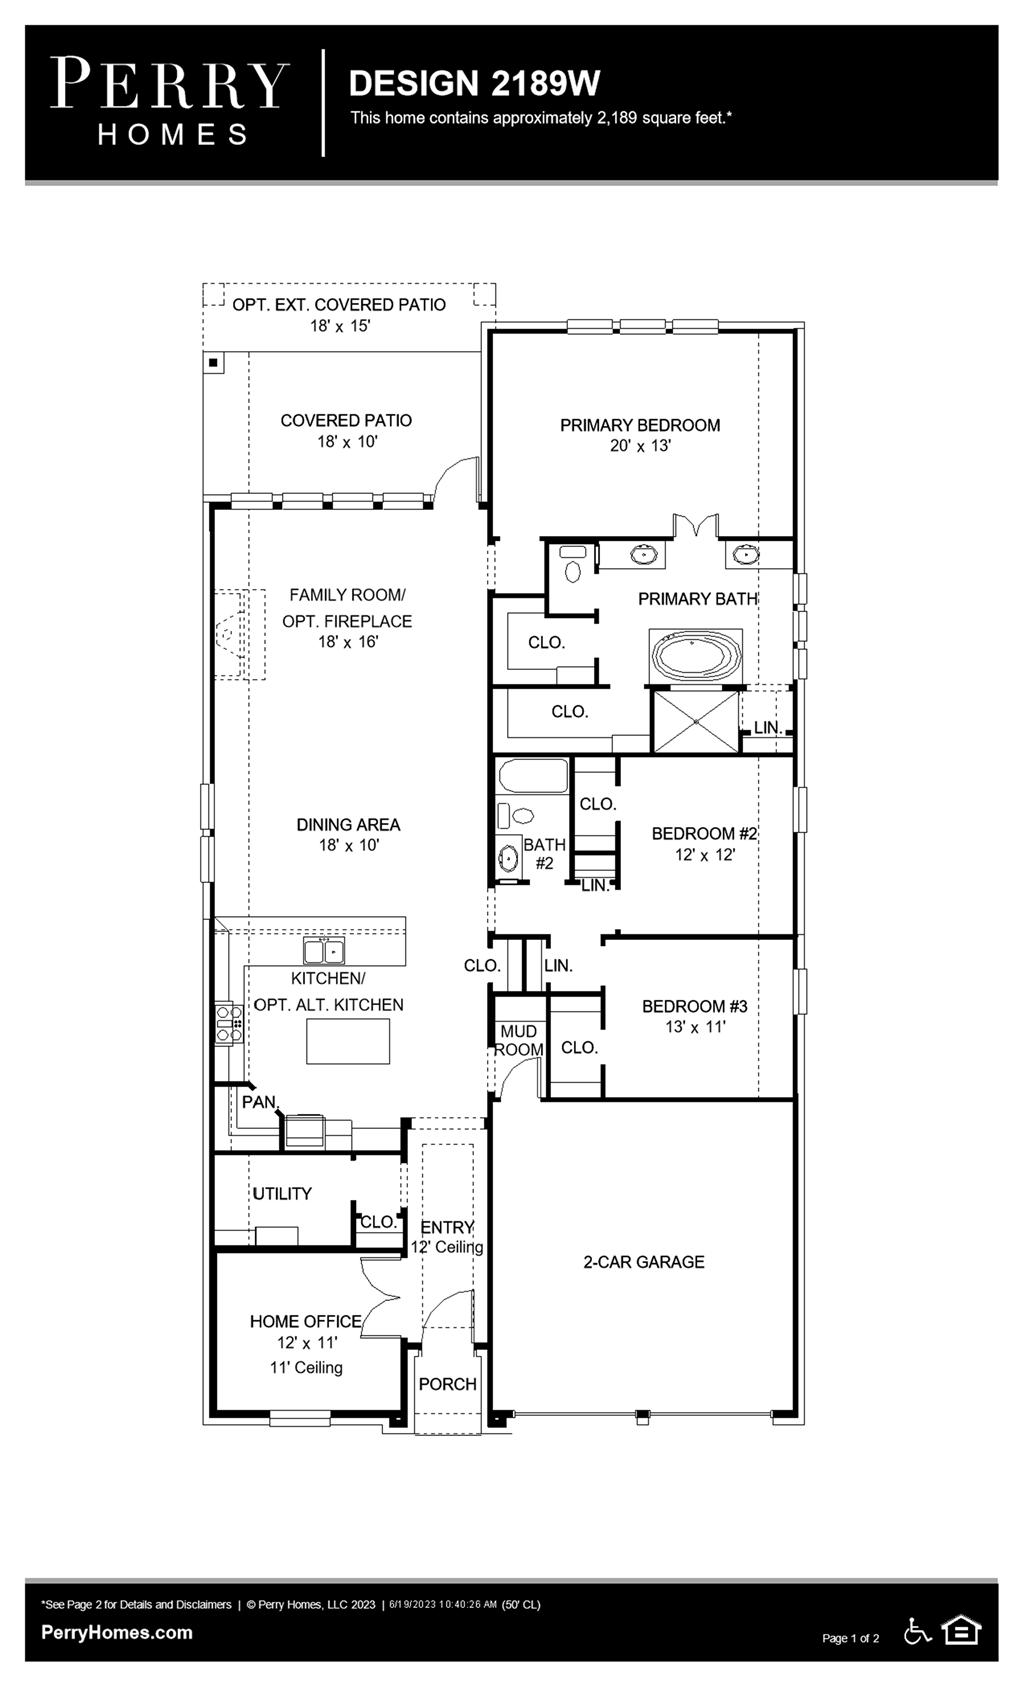 Floor Plan for 2189W